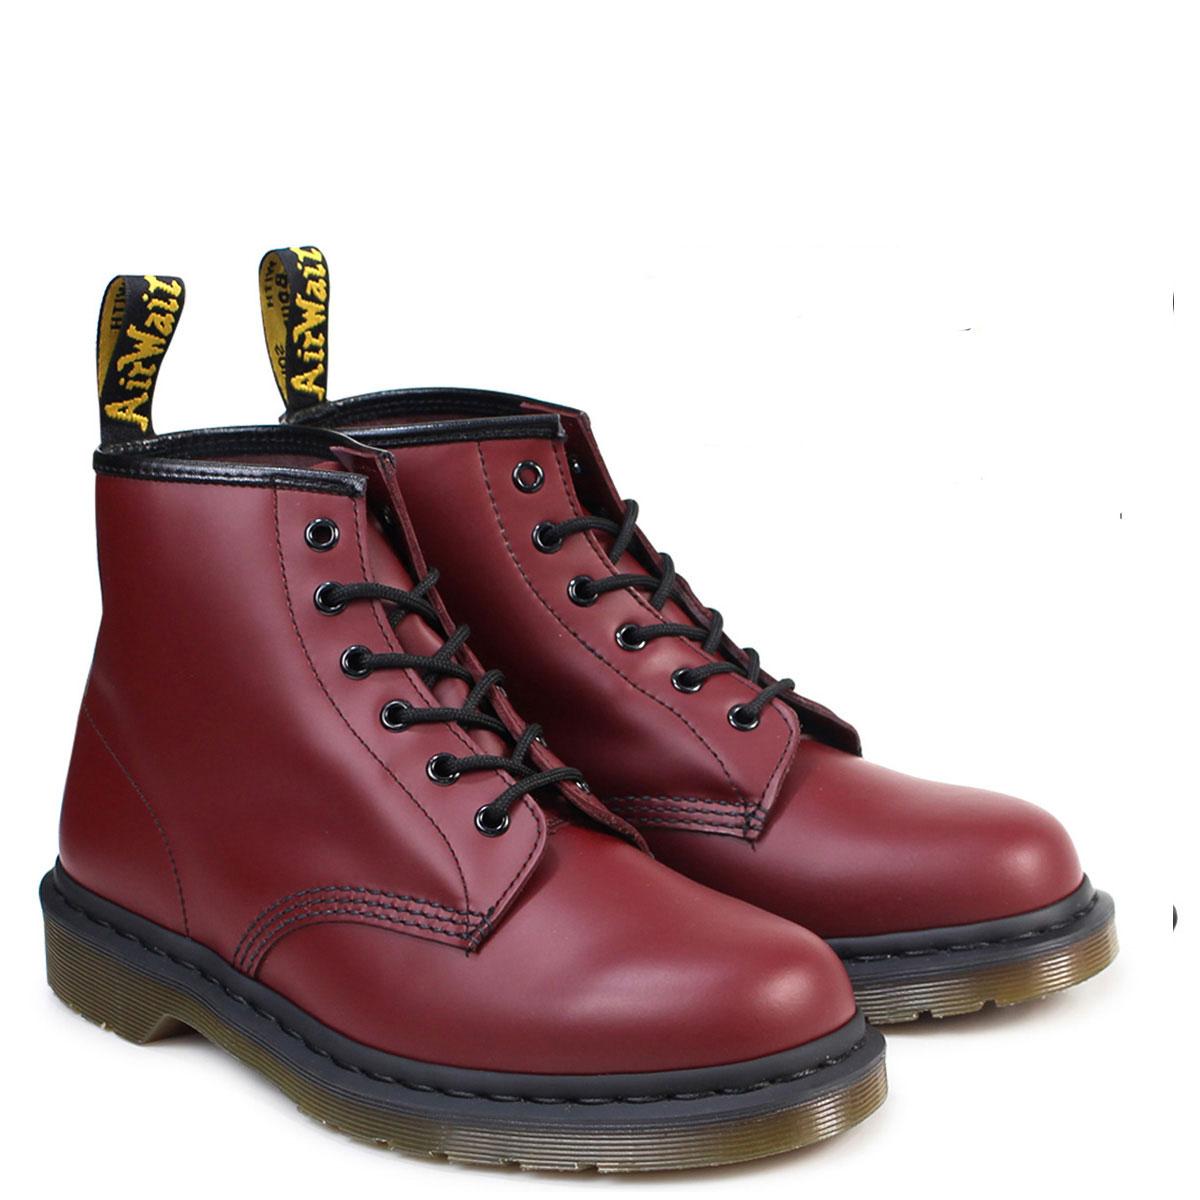 Dr.Martens 6EYE BOOT R10064600 6ホール メンズ レディース ドクターマーチン 101 ブーツ チェリーレッド